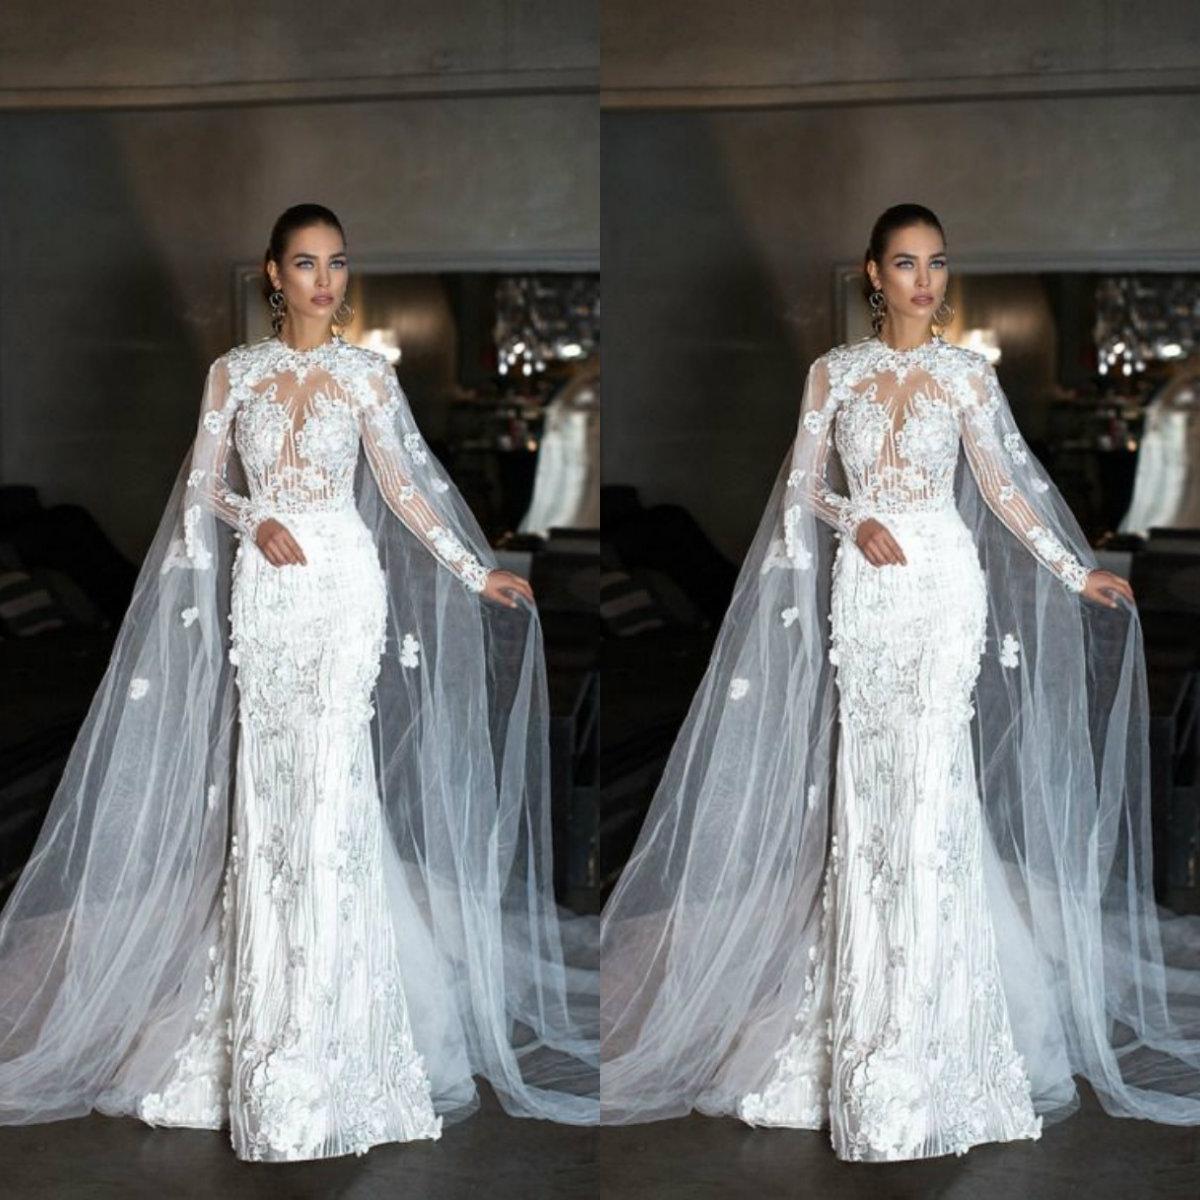 Exclusive Design Wedding Wrap 2019 Tulle Cloak Lace Ladies Bridal Cape Sleeveless Bridal Shawl Customized Wedding Jackets Free Shipping